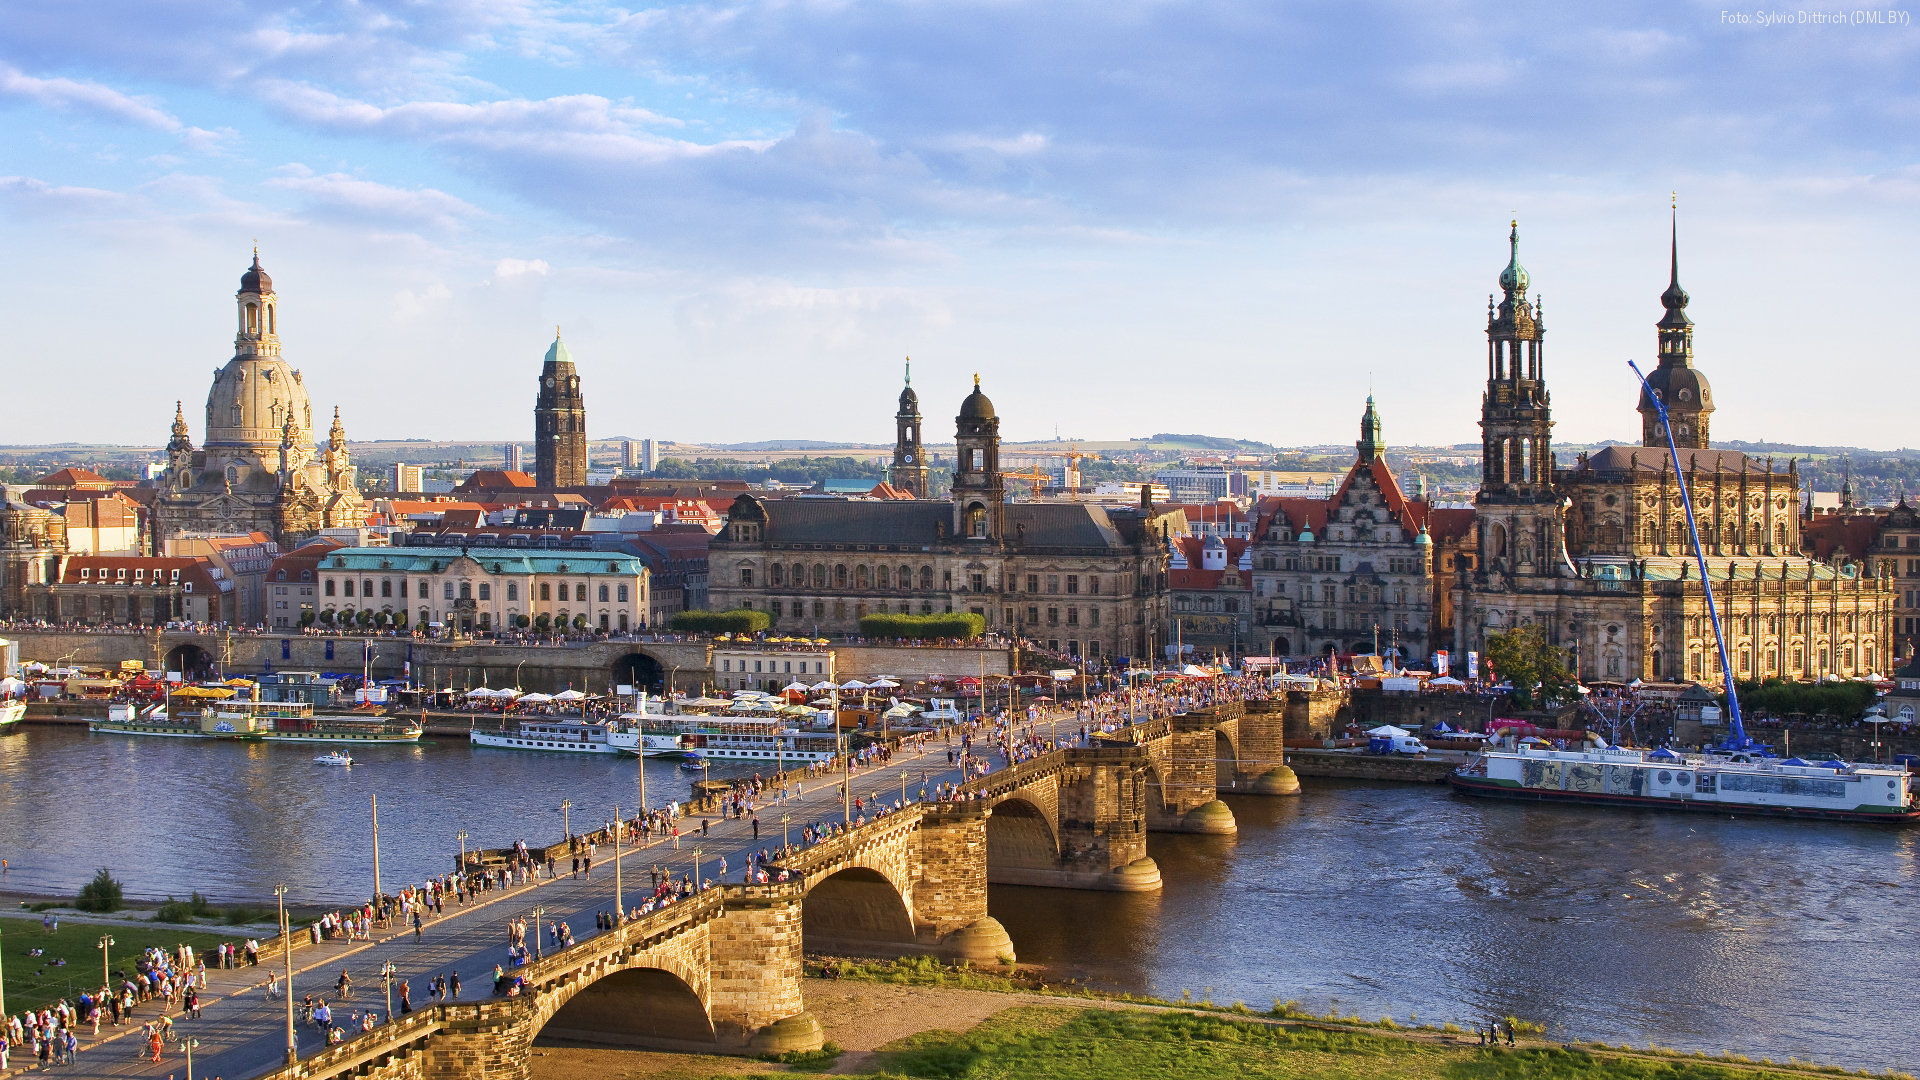 Dresden Silhouette Foto: Dmg/dittrichpicture hd